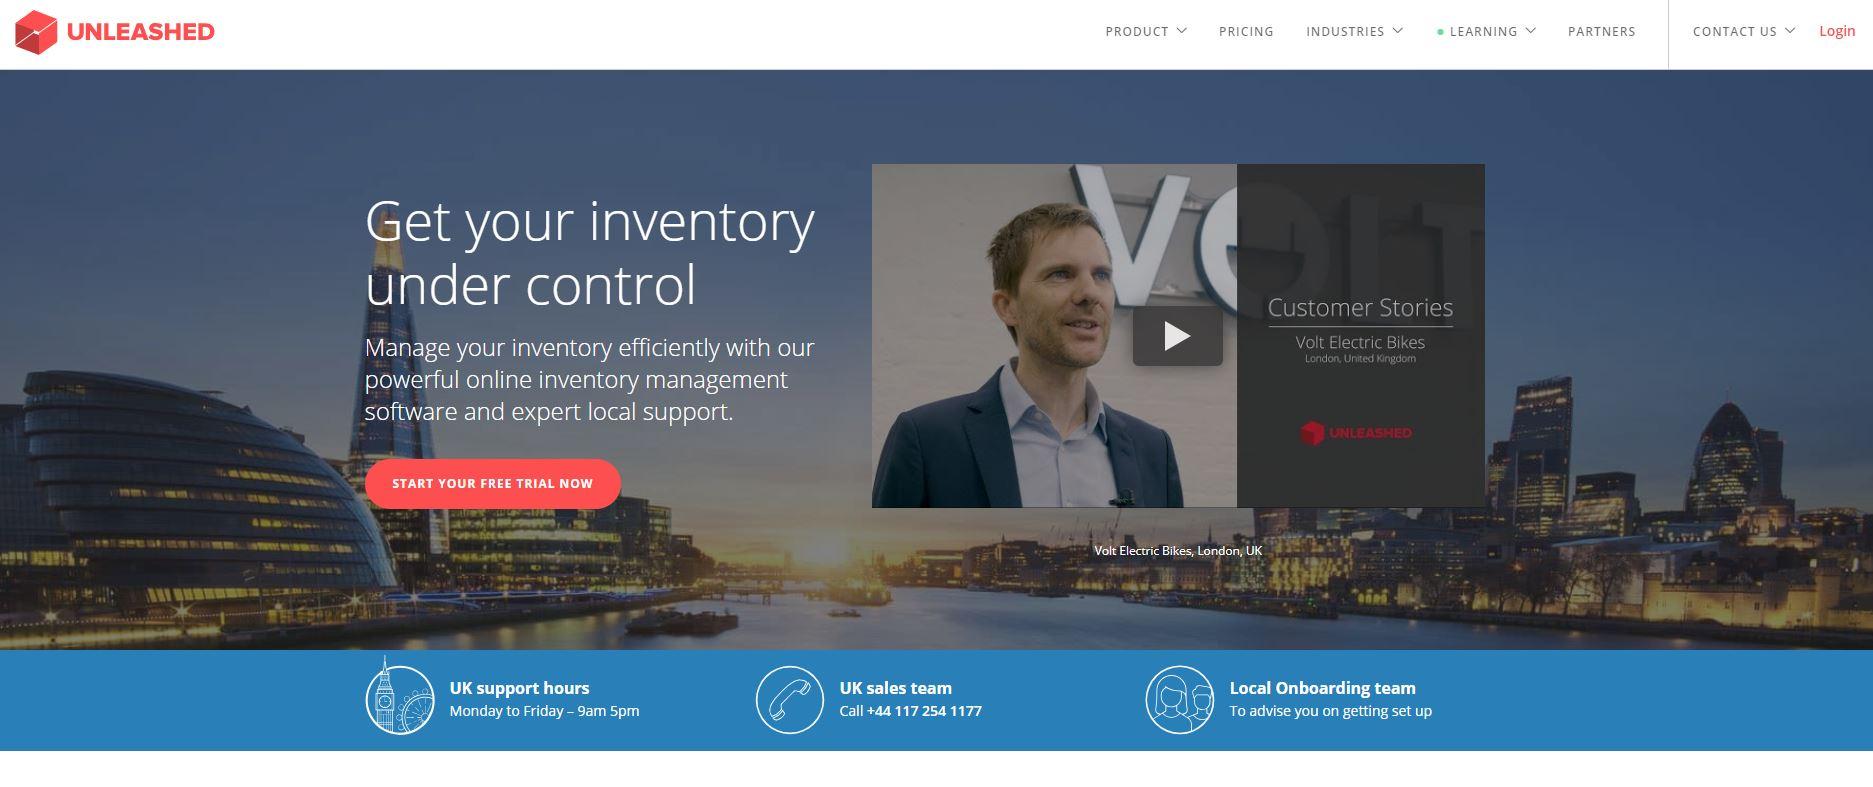 Unleashed website